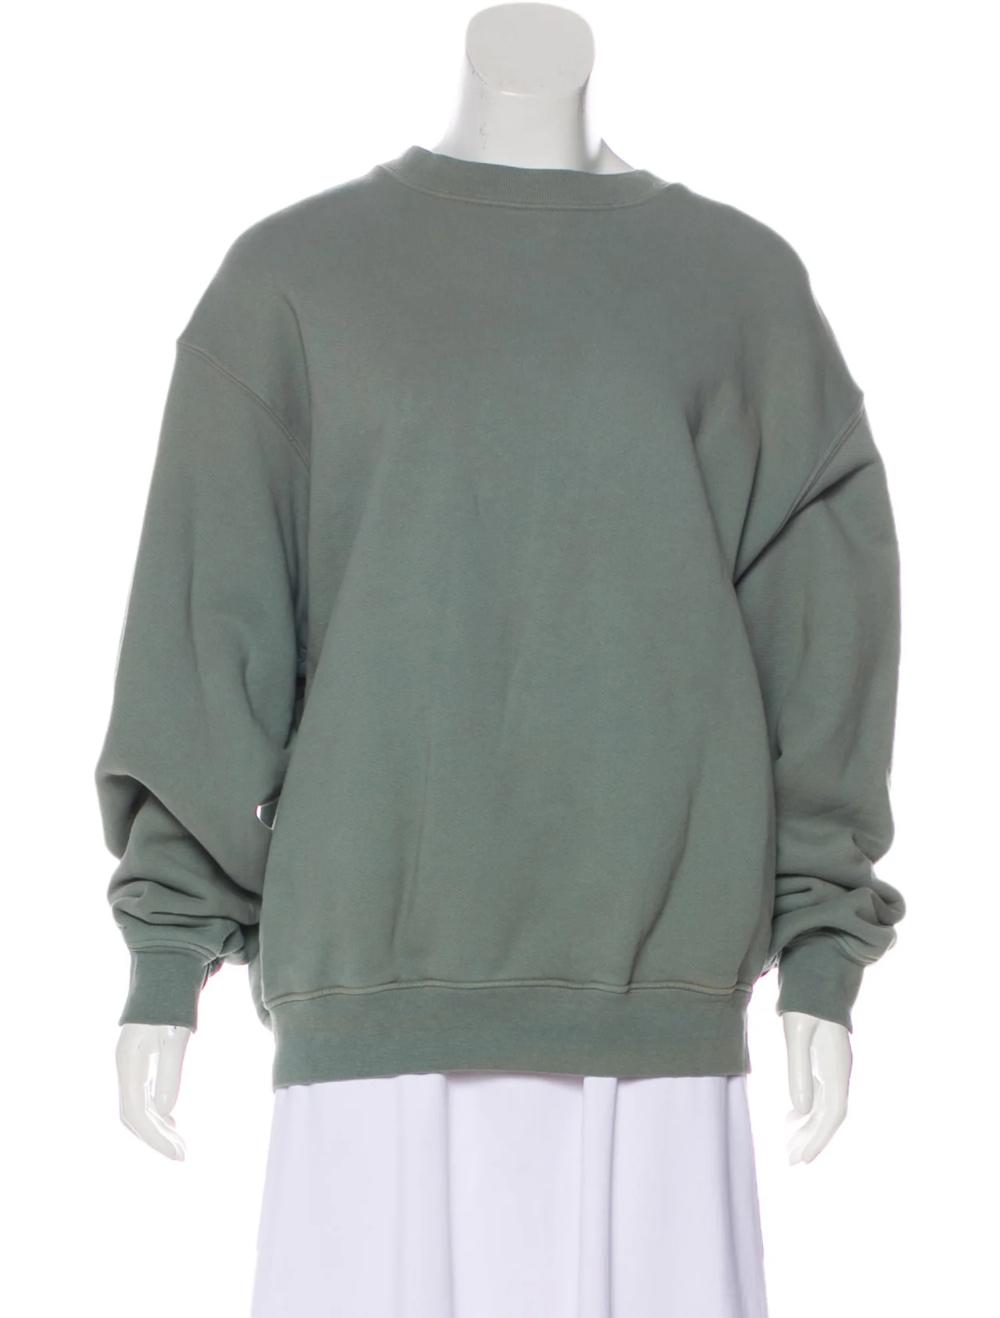 Yeezy Distressed Crew Neck Sweatshirt Clothing Wyeez22839 The Realreal Crew Neck Sweatshirt Sweatshirts Yeezy Outfit [ 1318 x 1000 Pixel ]